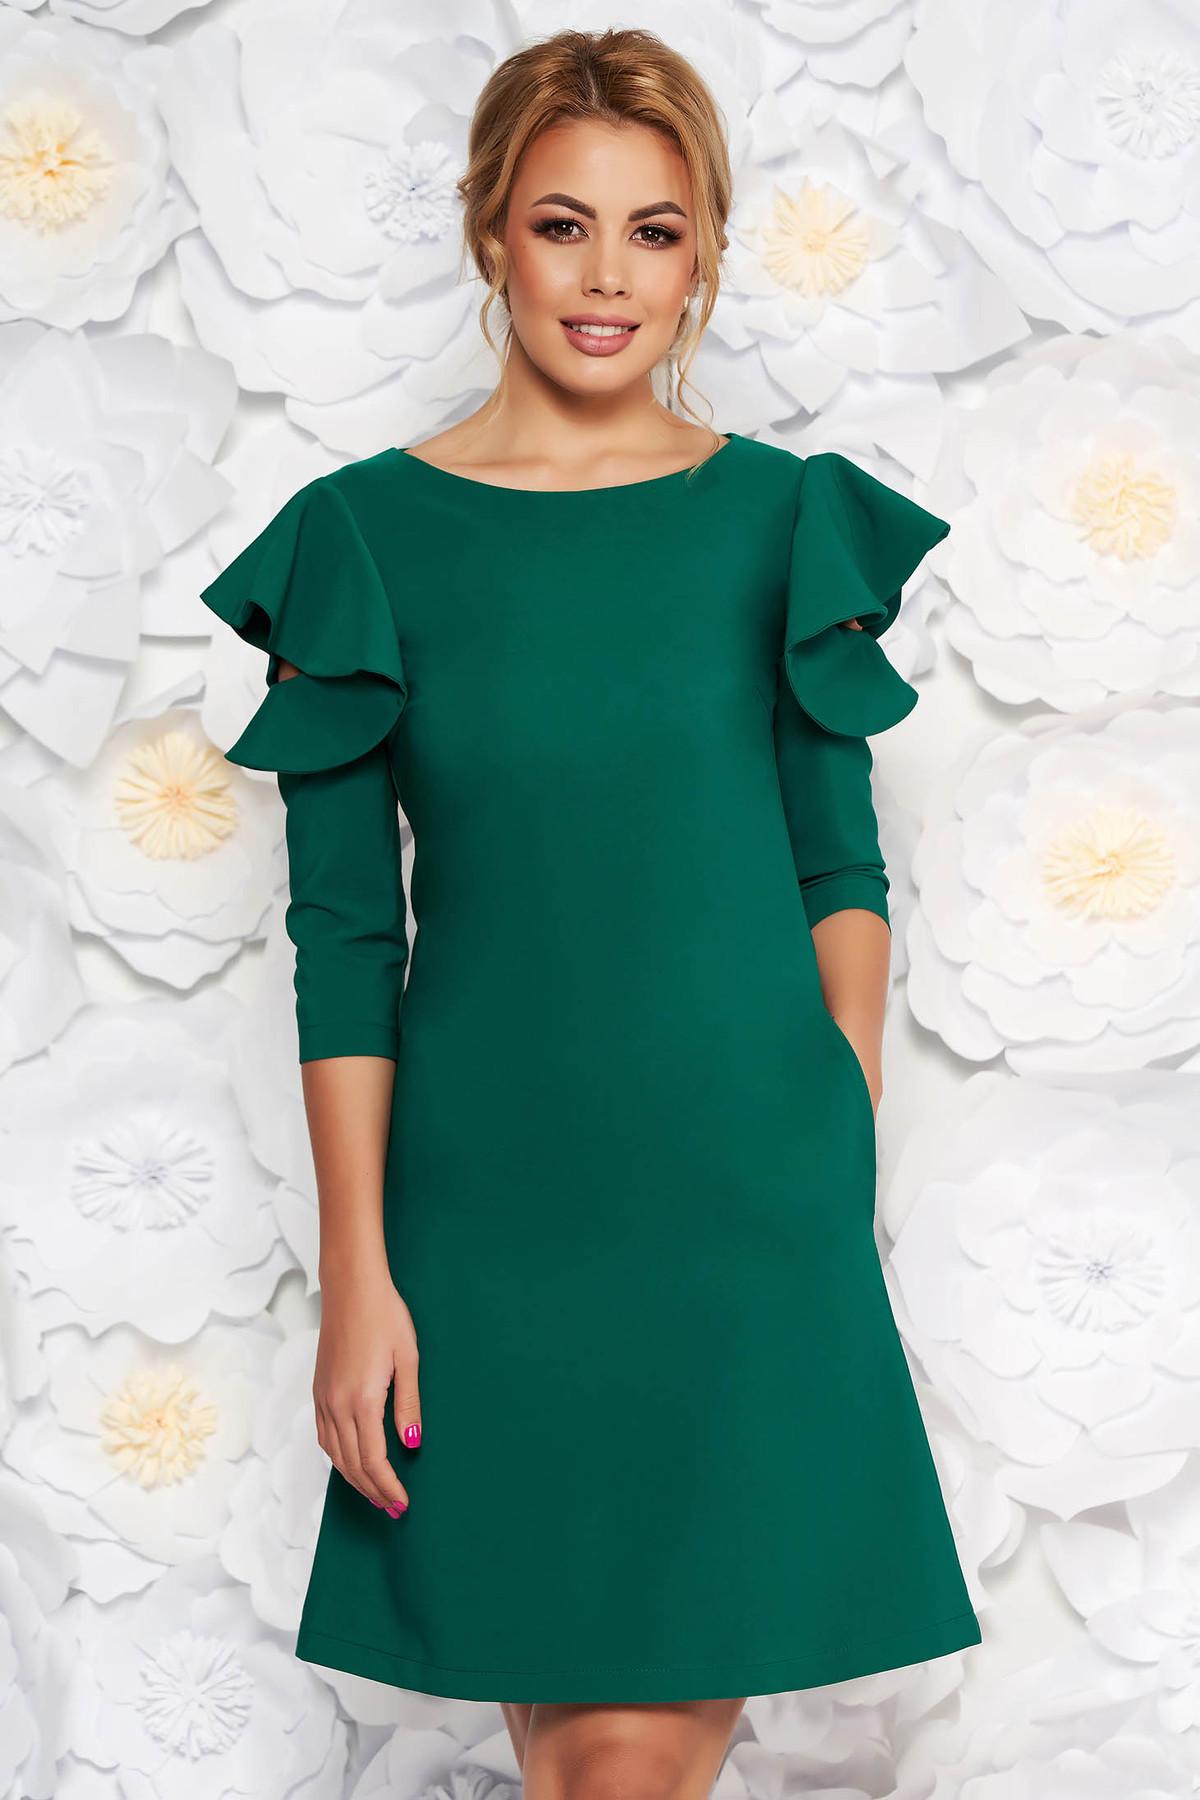 Rochie LaDonna verde-deschis cu croi larg din stofa usor elastica cu volanase la maneca